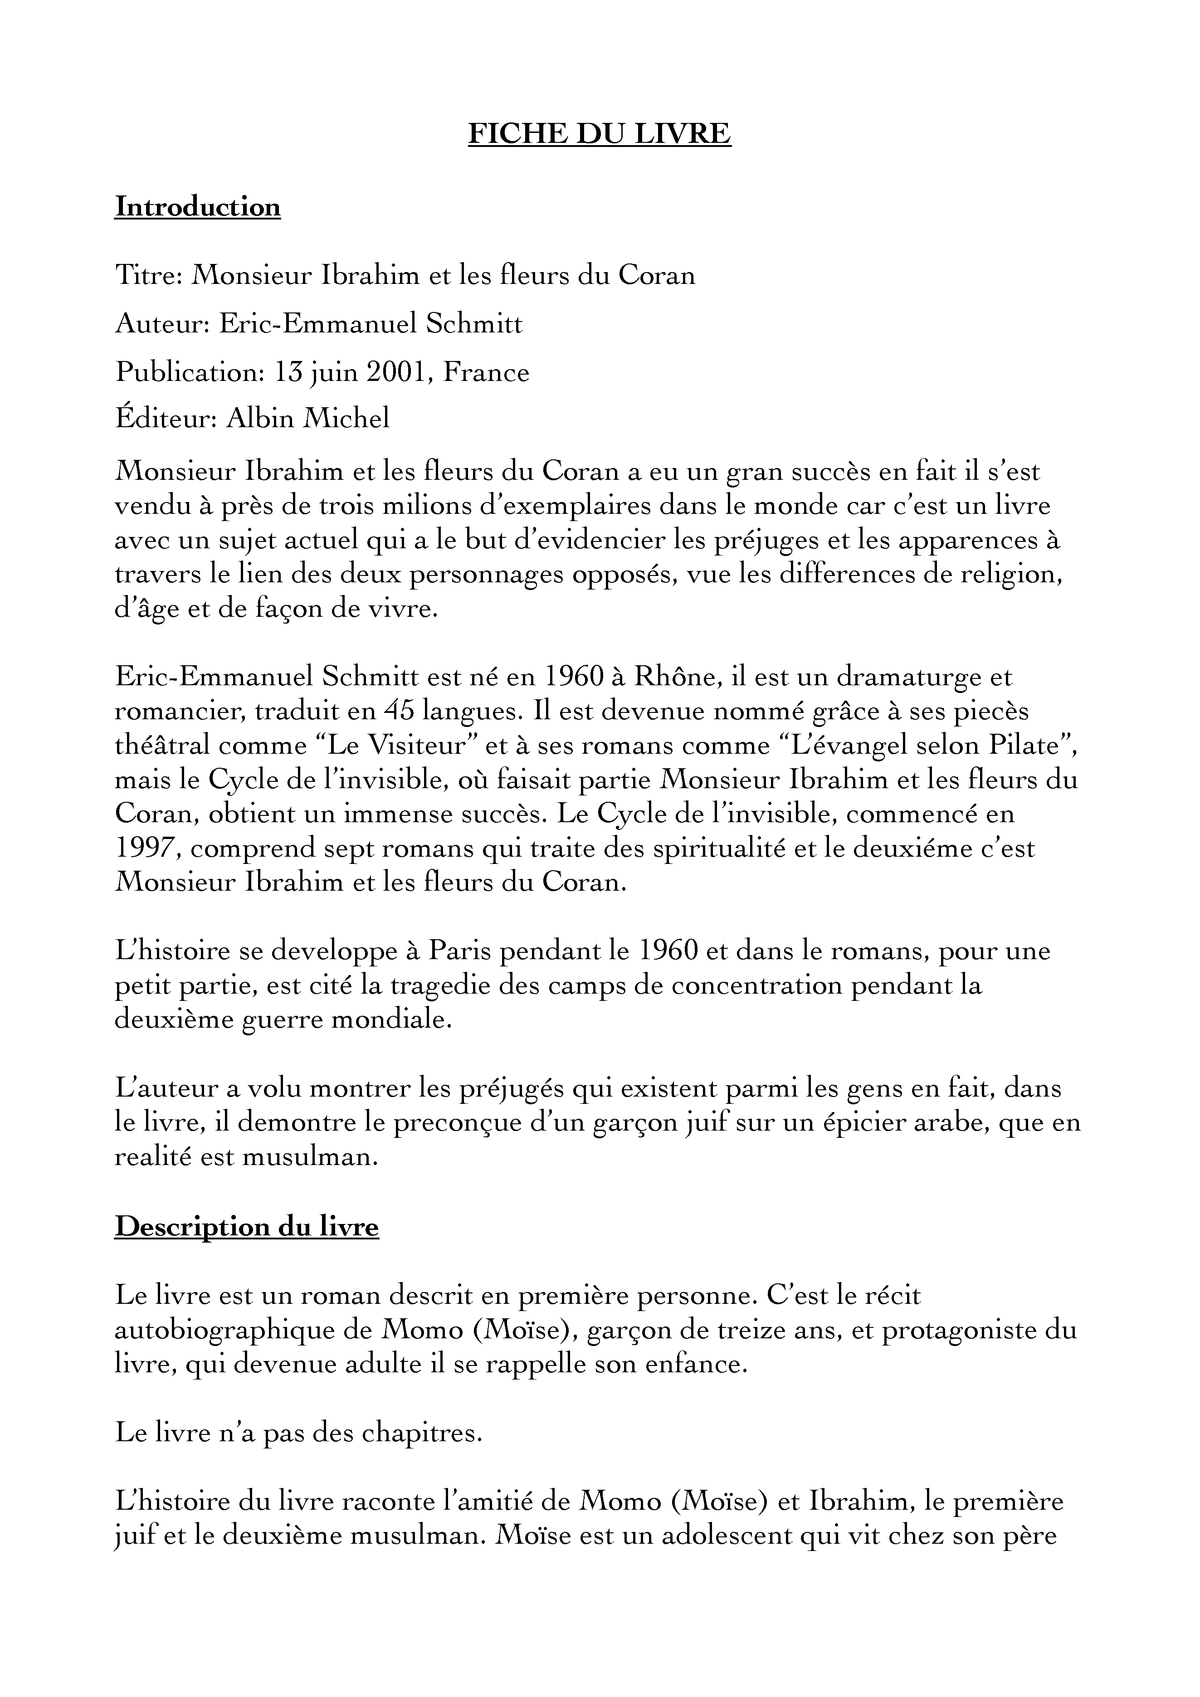 Analyse Livre Schmitt Pdf Linguistica Generale Lumsa